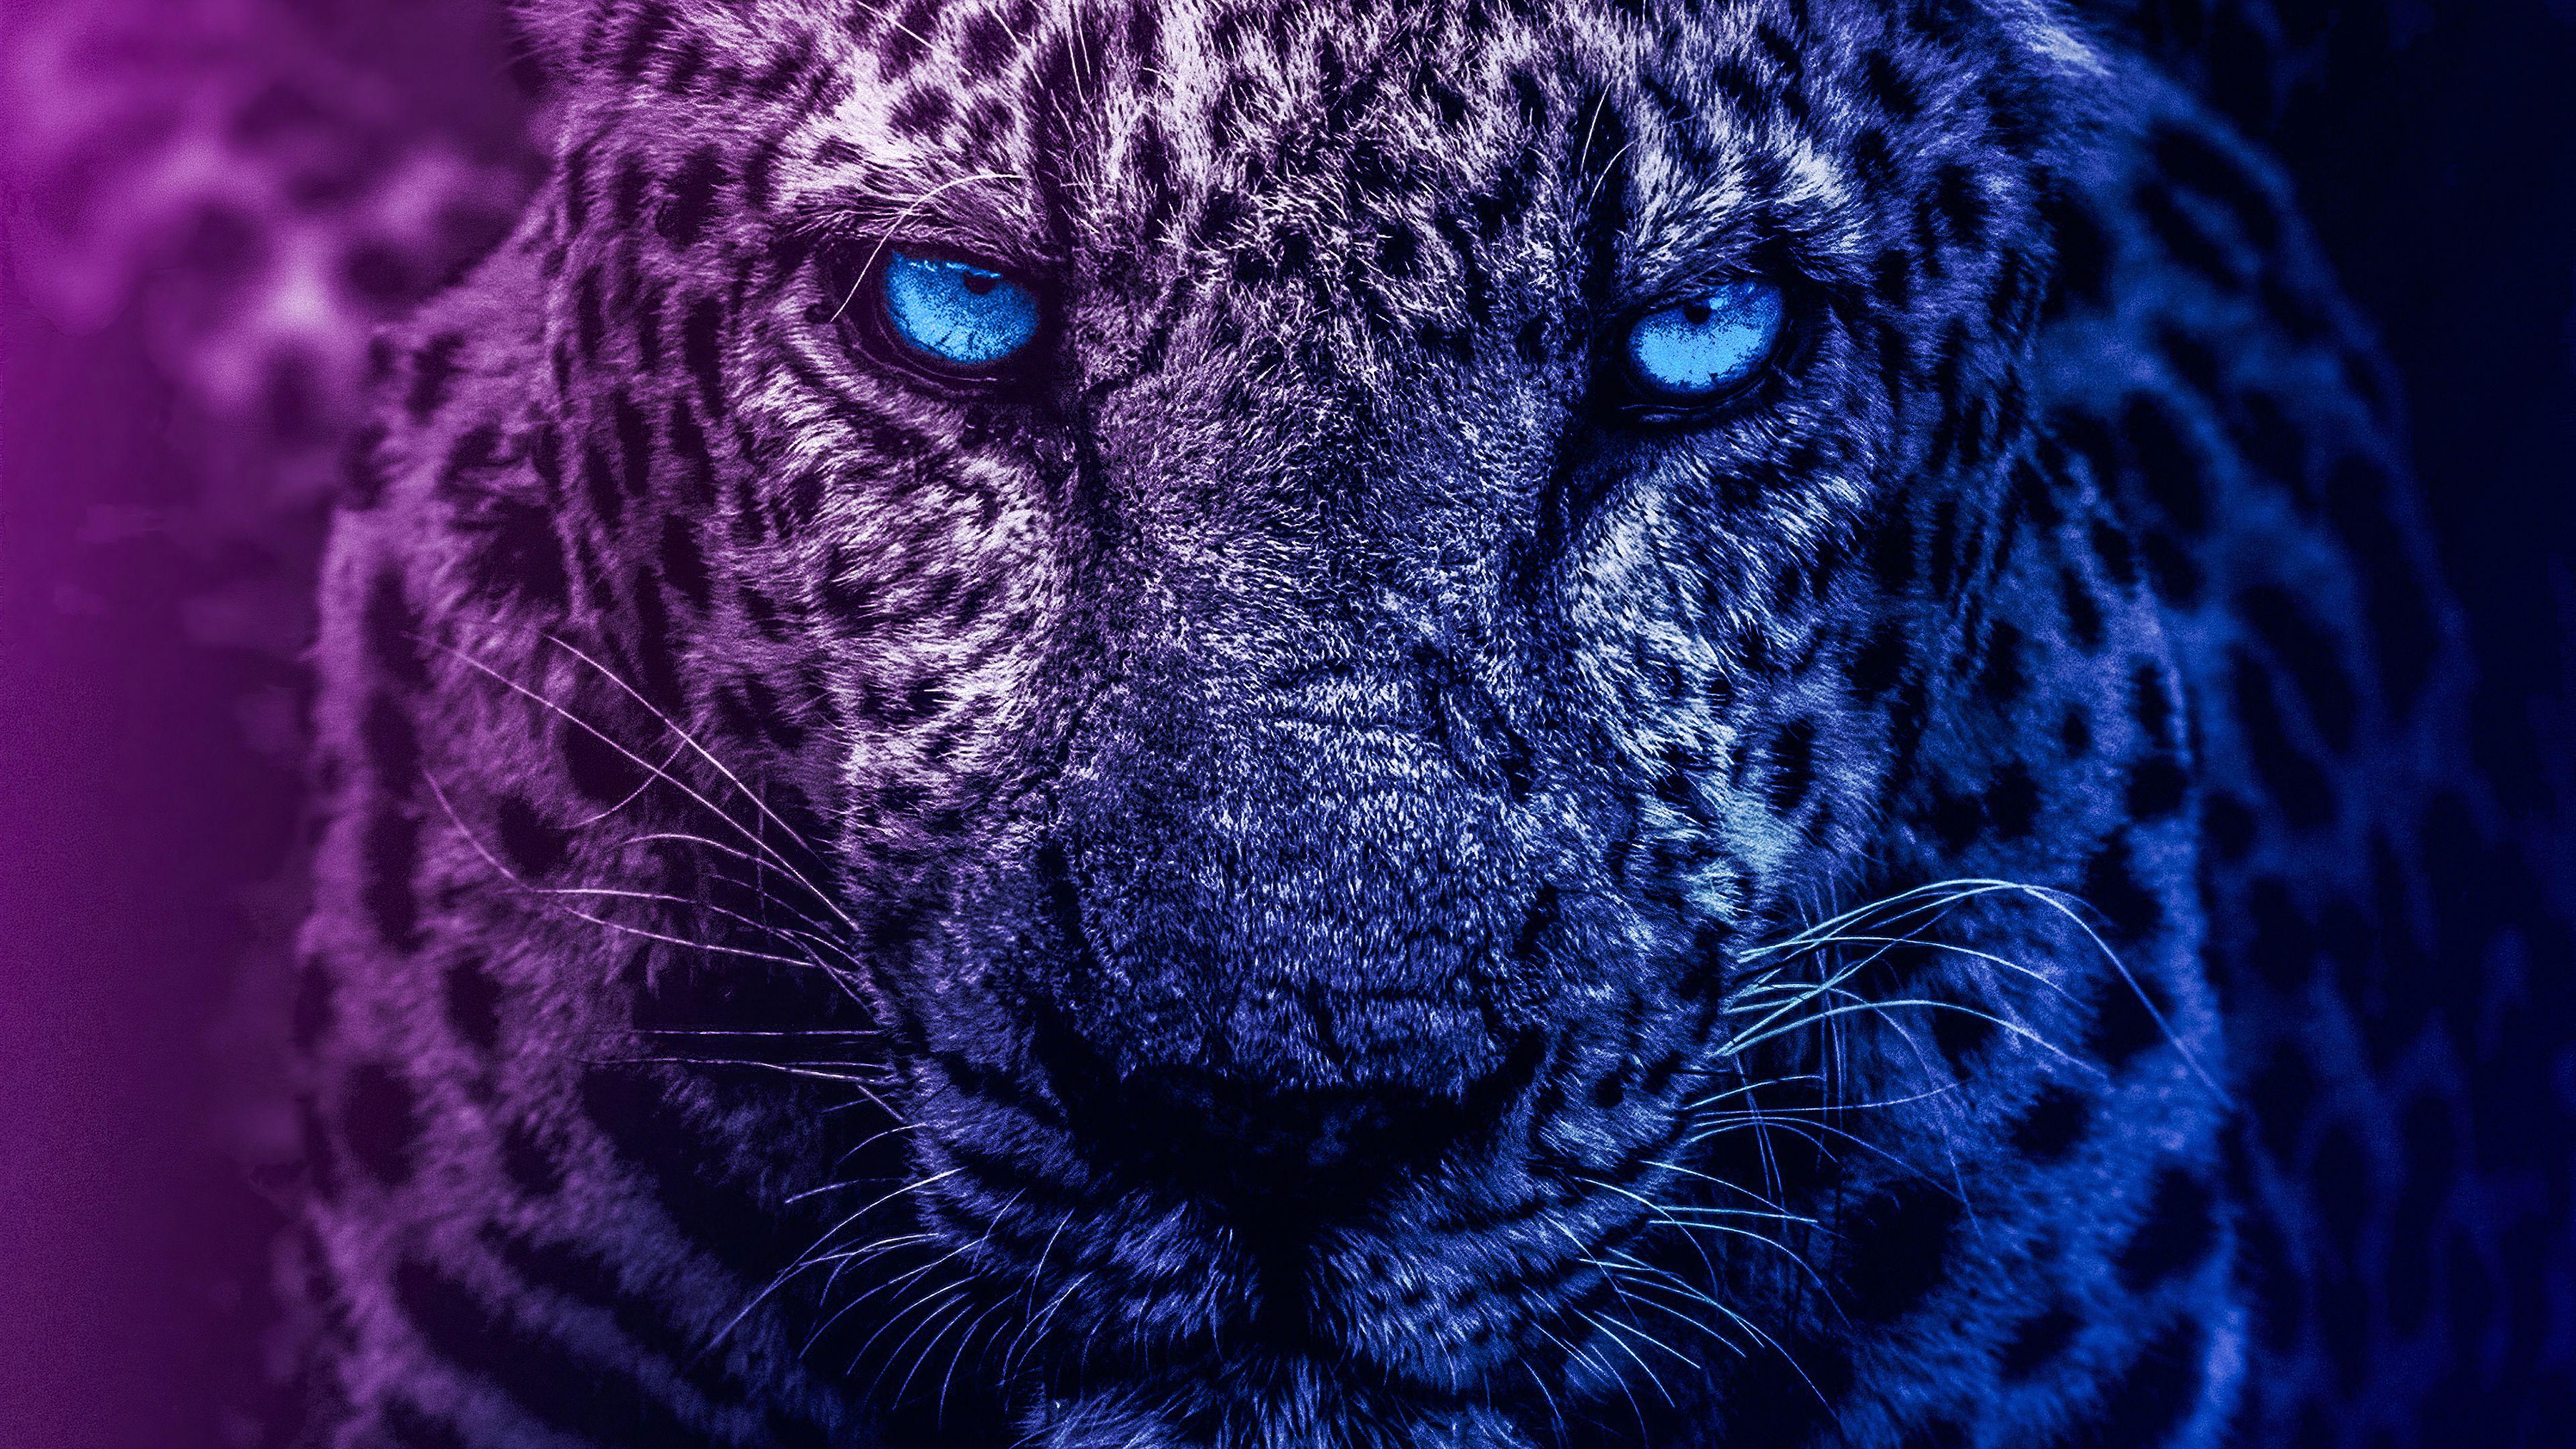 Blue Eyes Lion Lion Wallpapers 4k Lion 4k Wallpapper Blue Eyes Lions 4k Wallpaper In 2020 Lion Wallpaper Animal Planet Lion